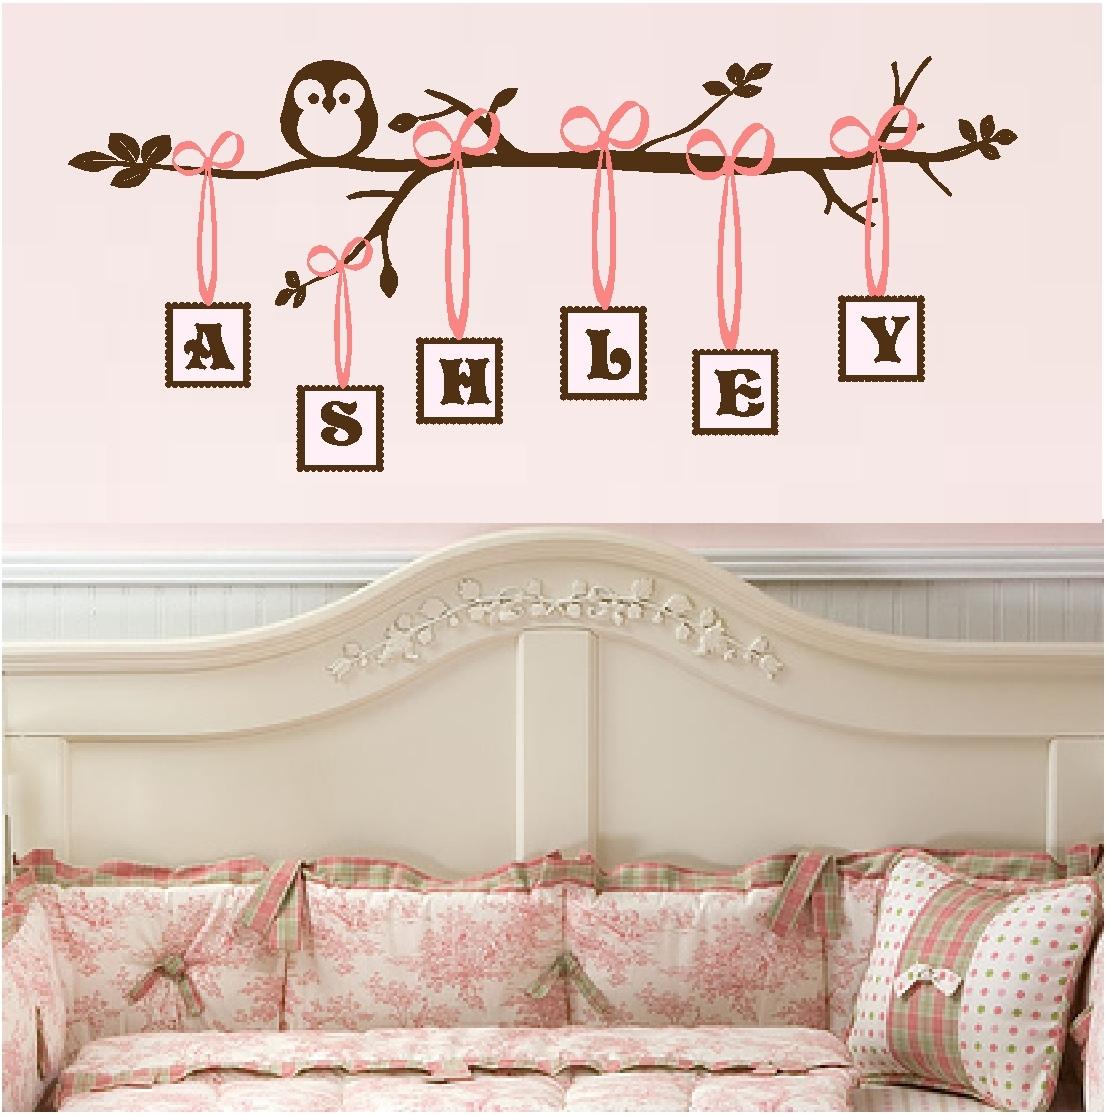 Girls Nursery Wall Decor You Ll Love In 2021 Visualhunt